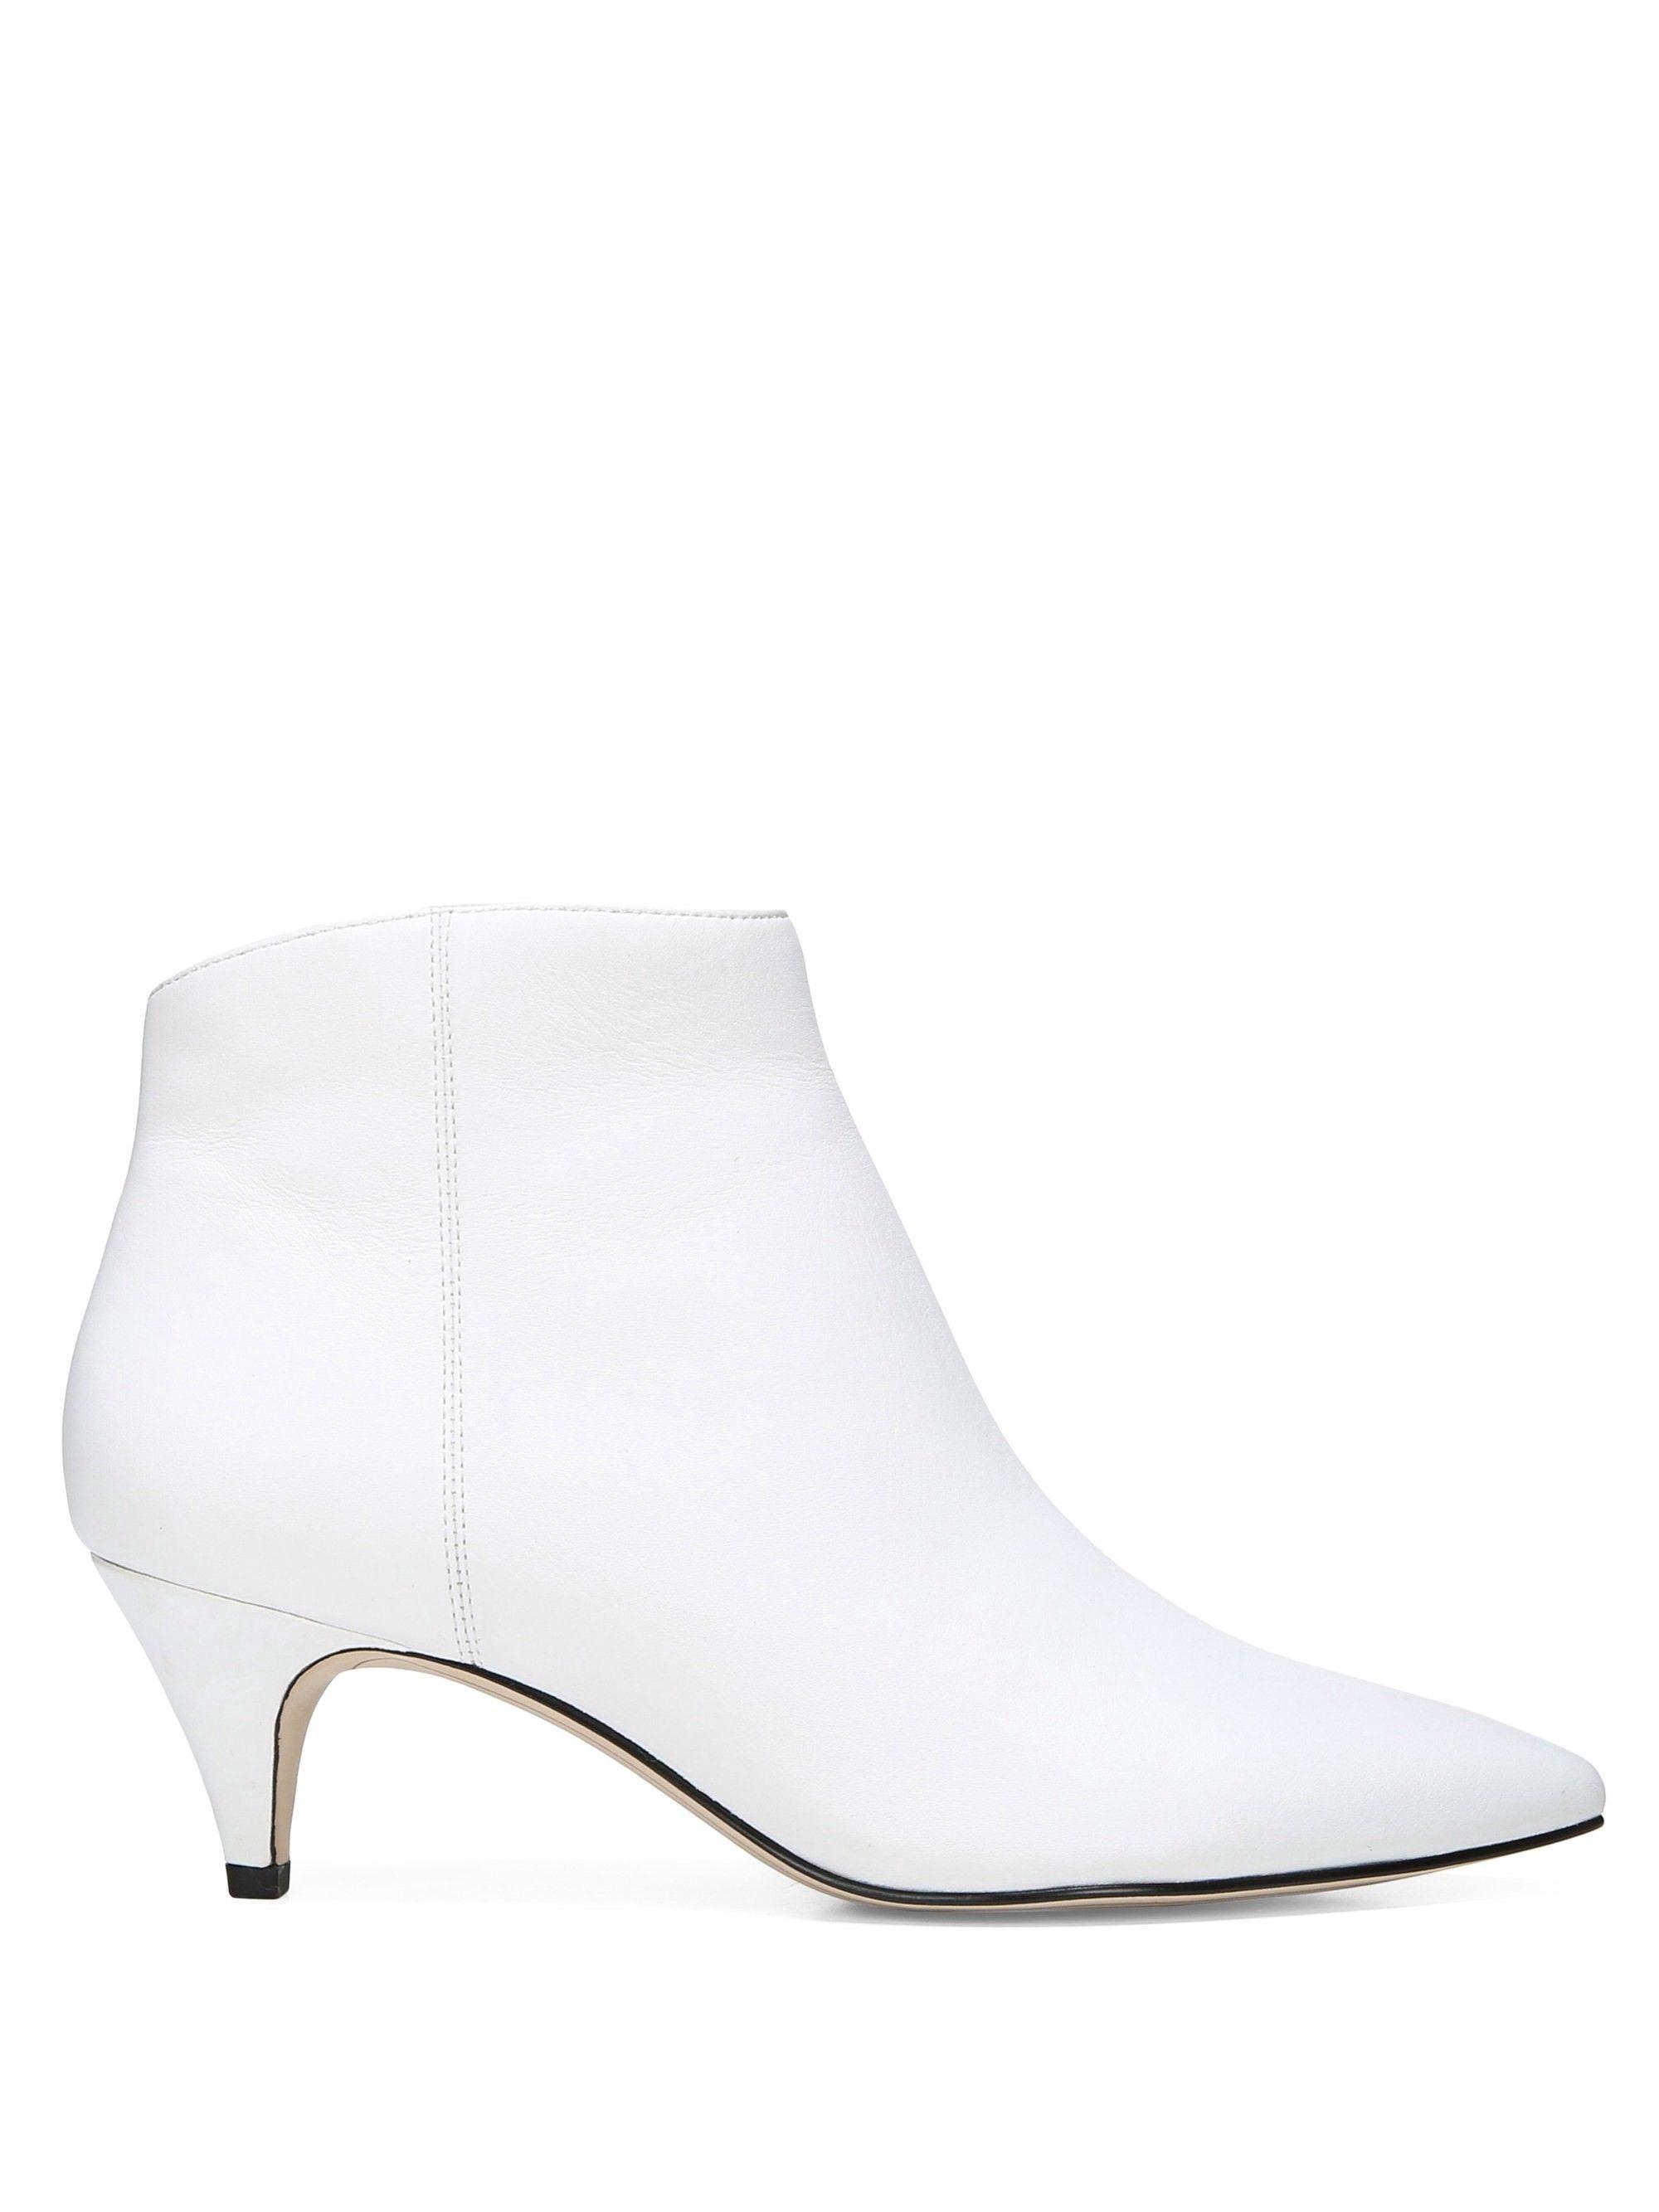 757e764d20db7 Sam Edelman Kinzey Leather Kitten Heel Booties - Bright White 6.5